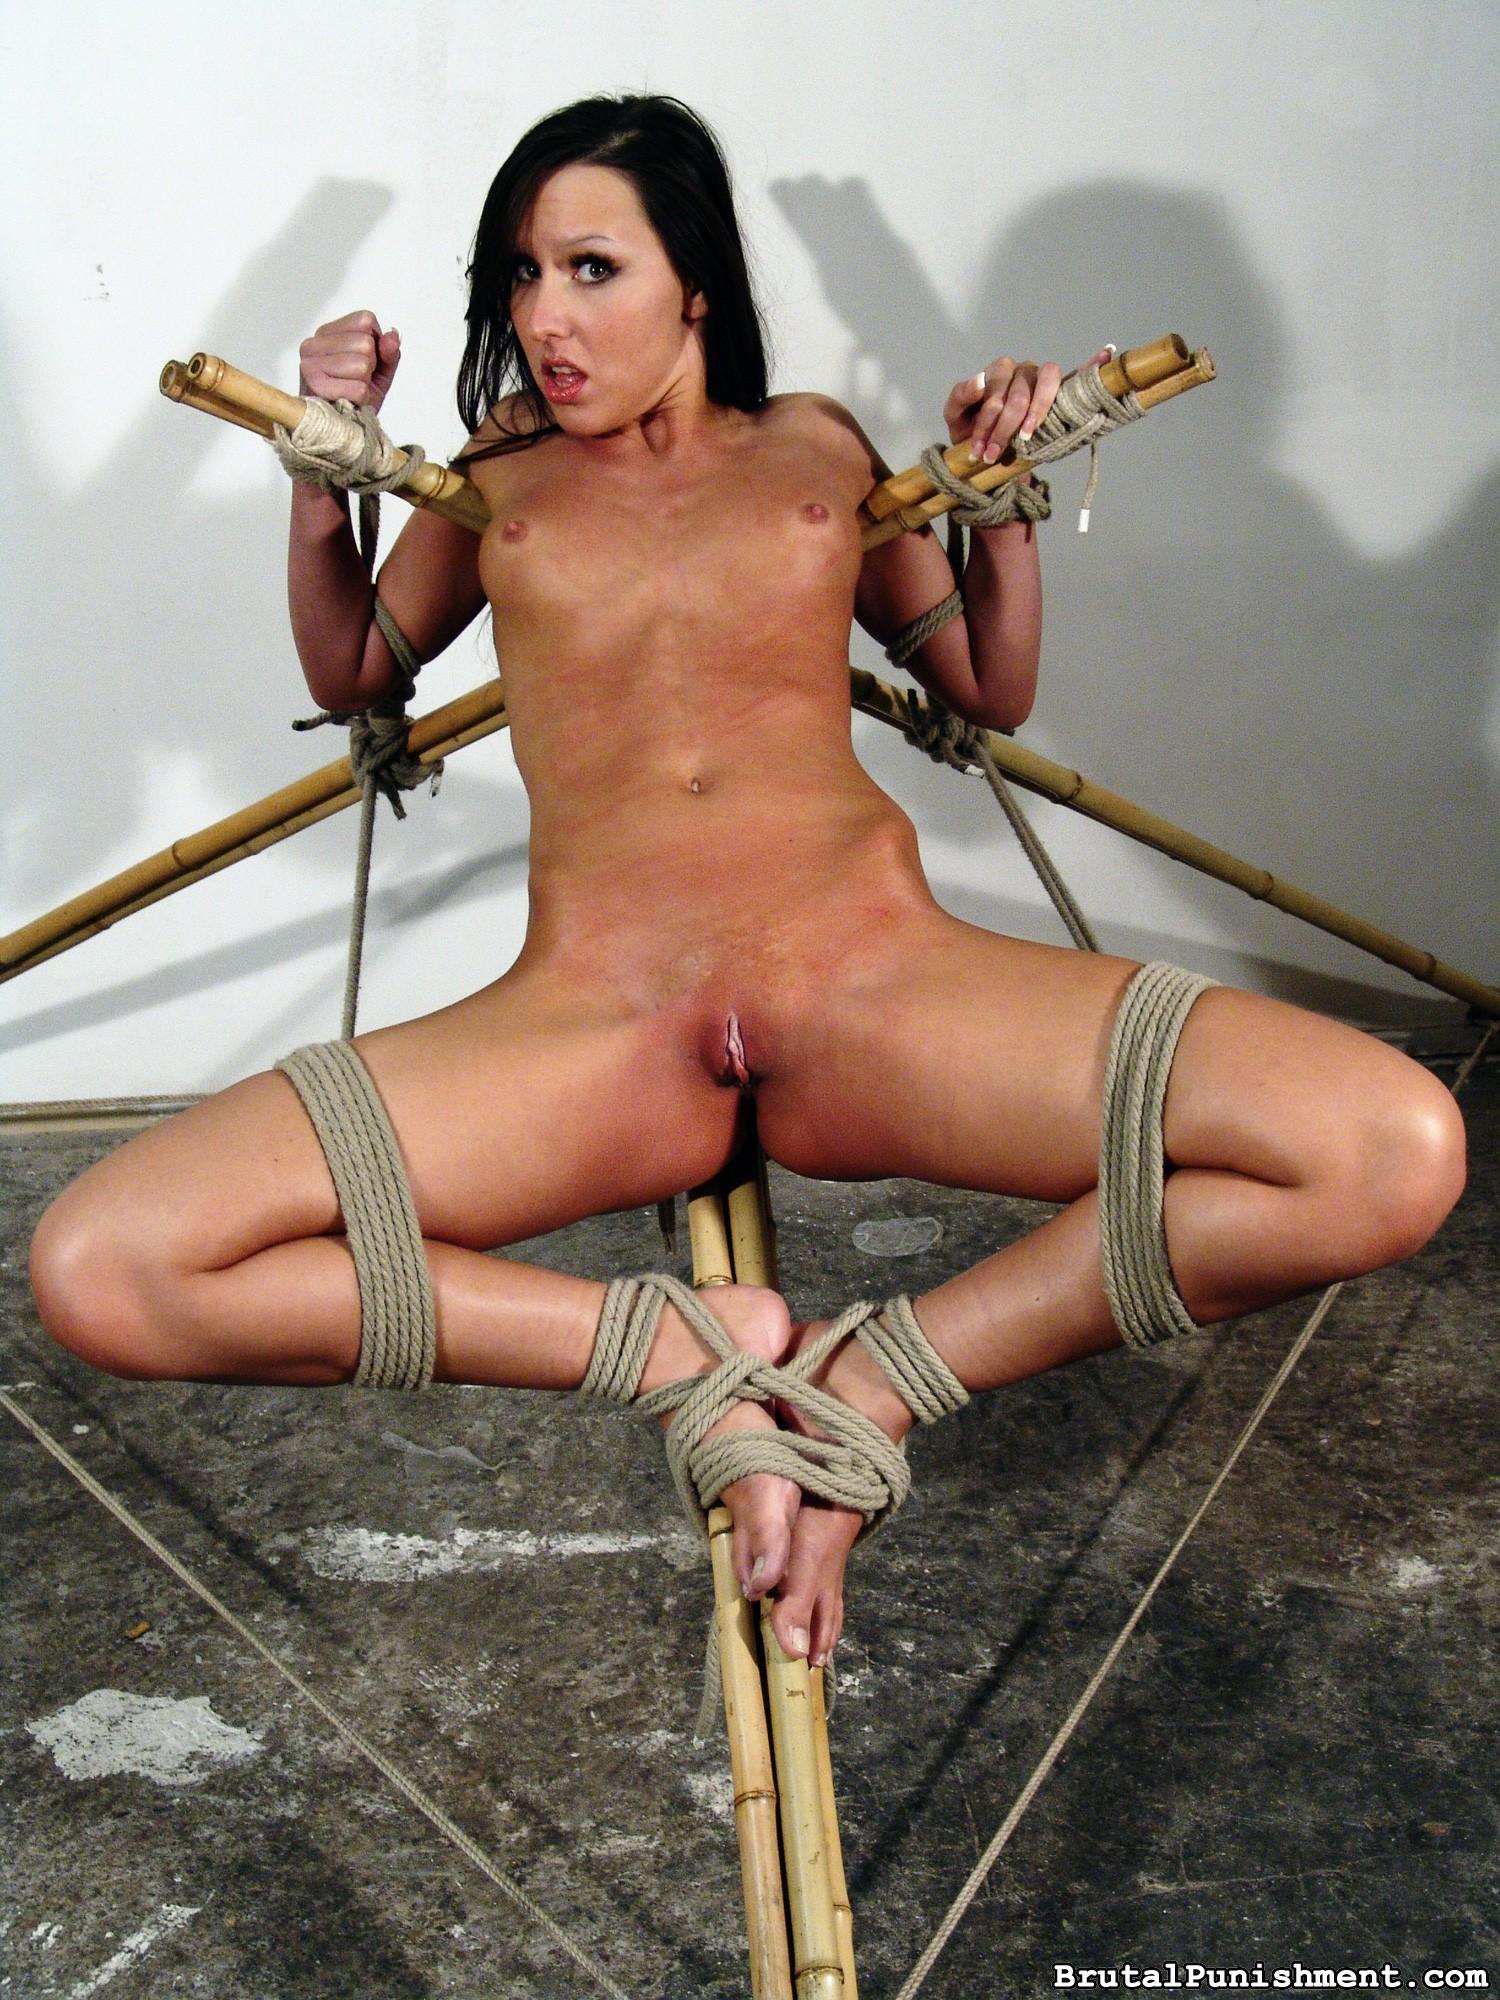 Naughty Agony Breezy Nicole Suffers Any Other Restrain Bondage Consultation